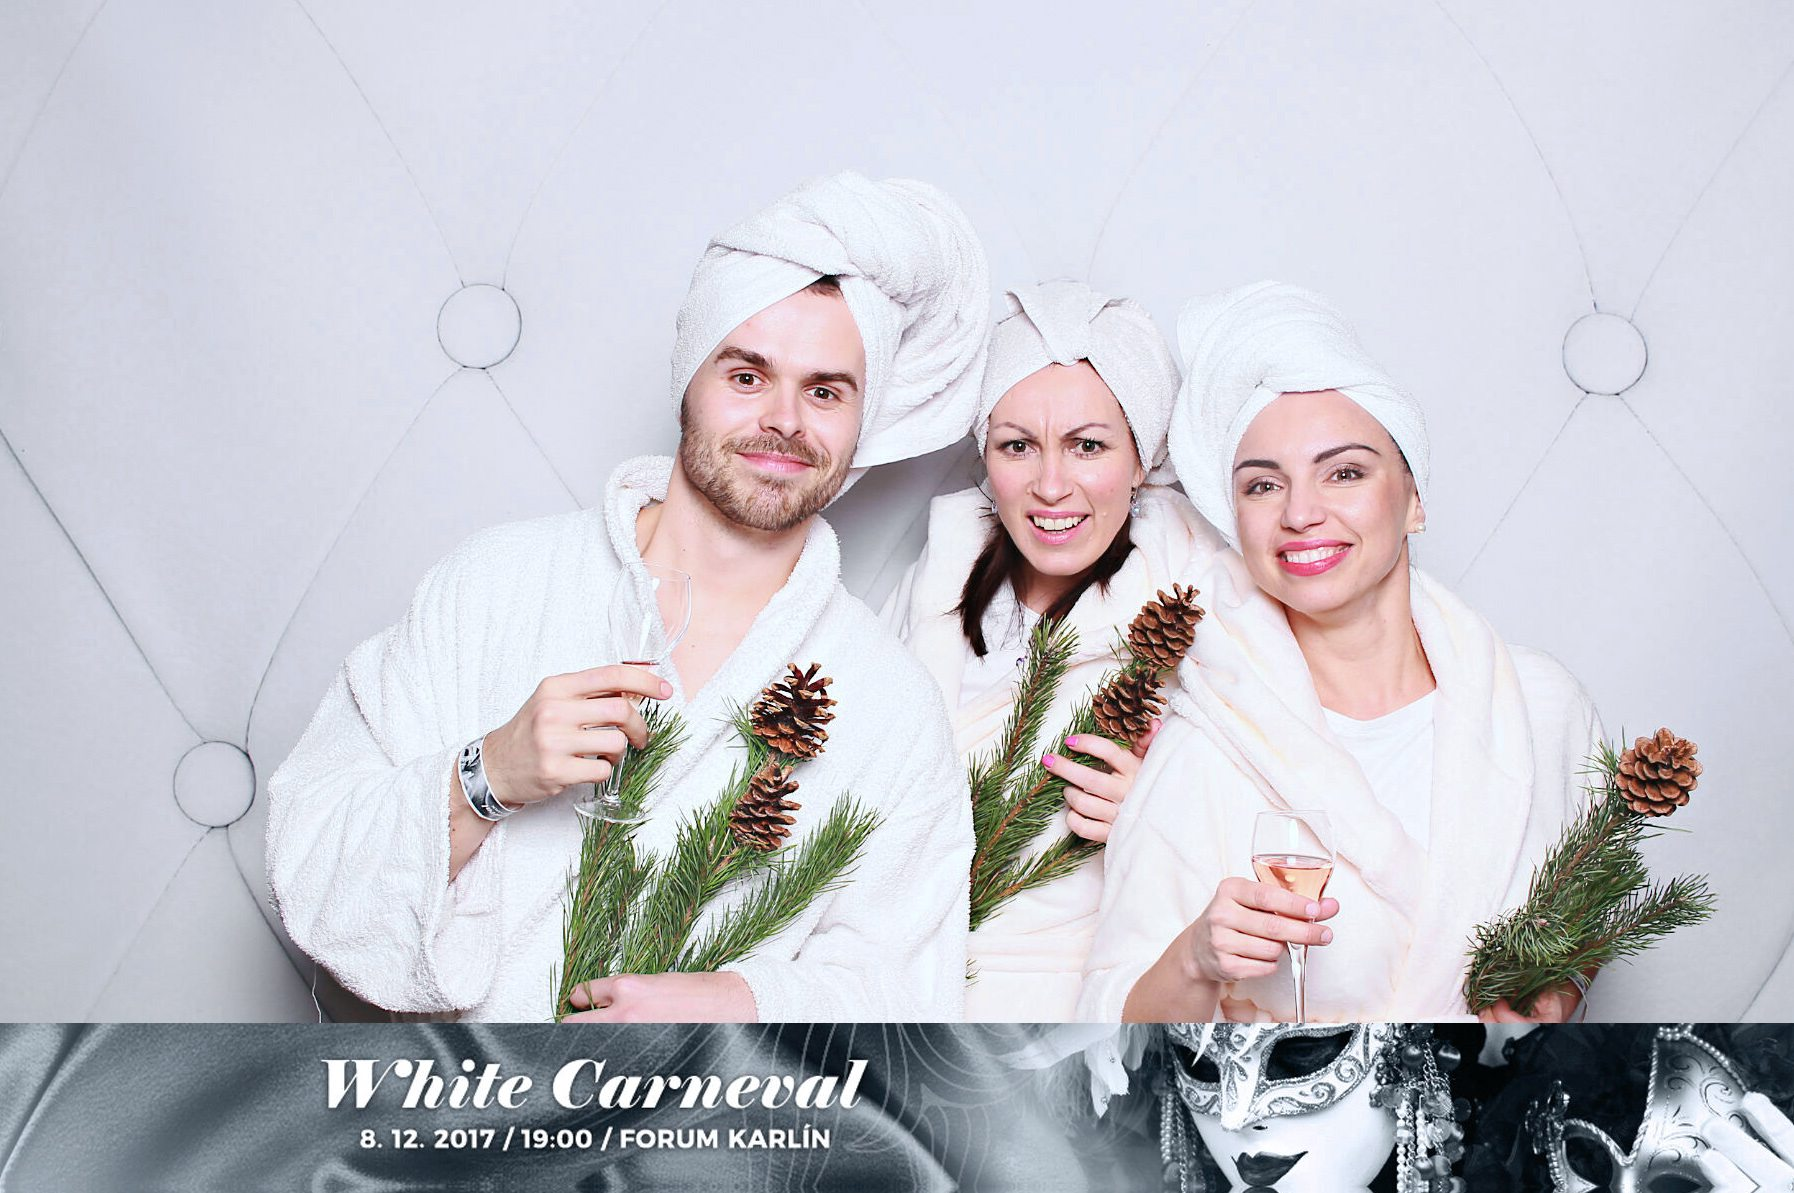 fotokoutek-white-carneval-1-forum-karlin-8-12-2017-355417